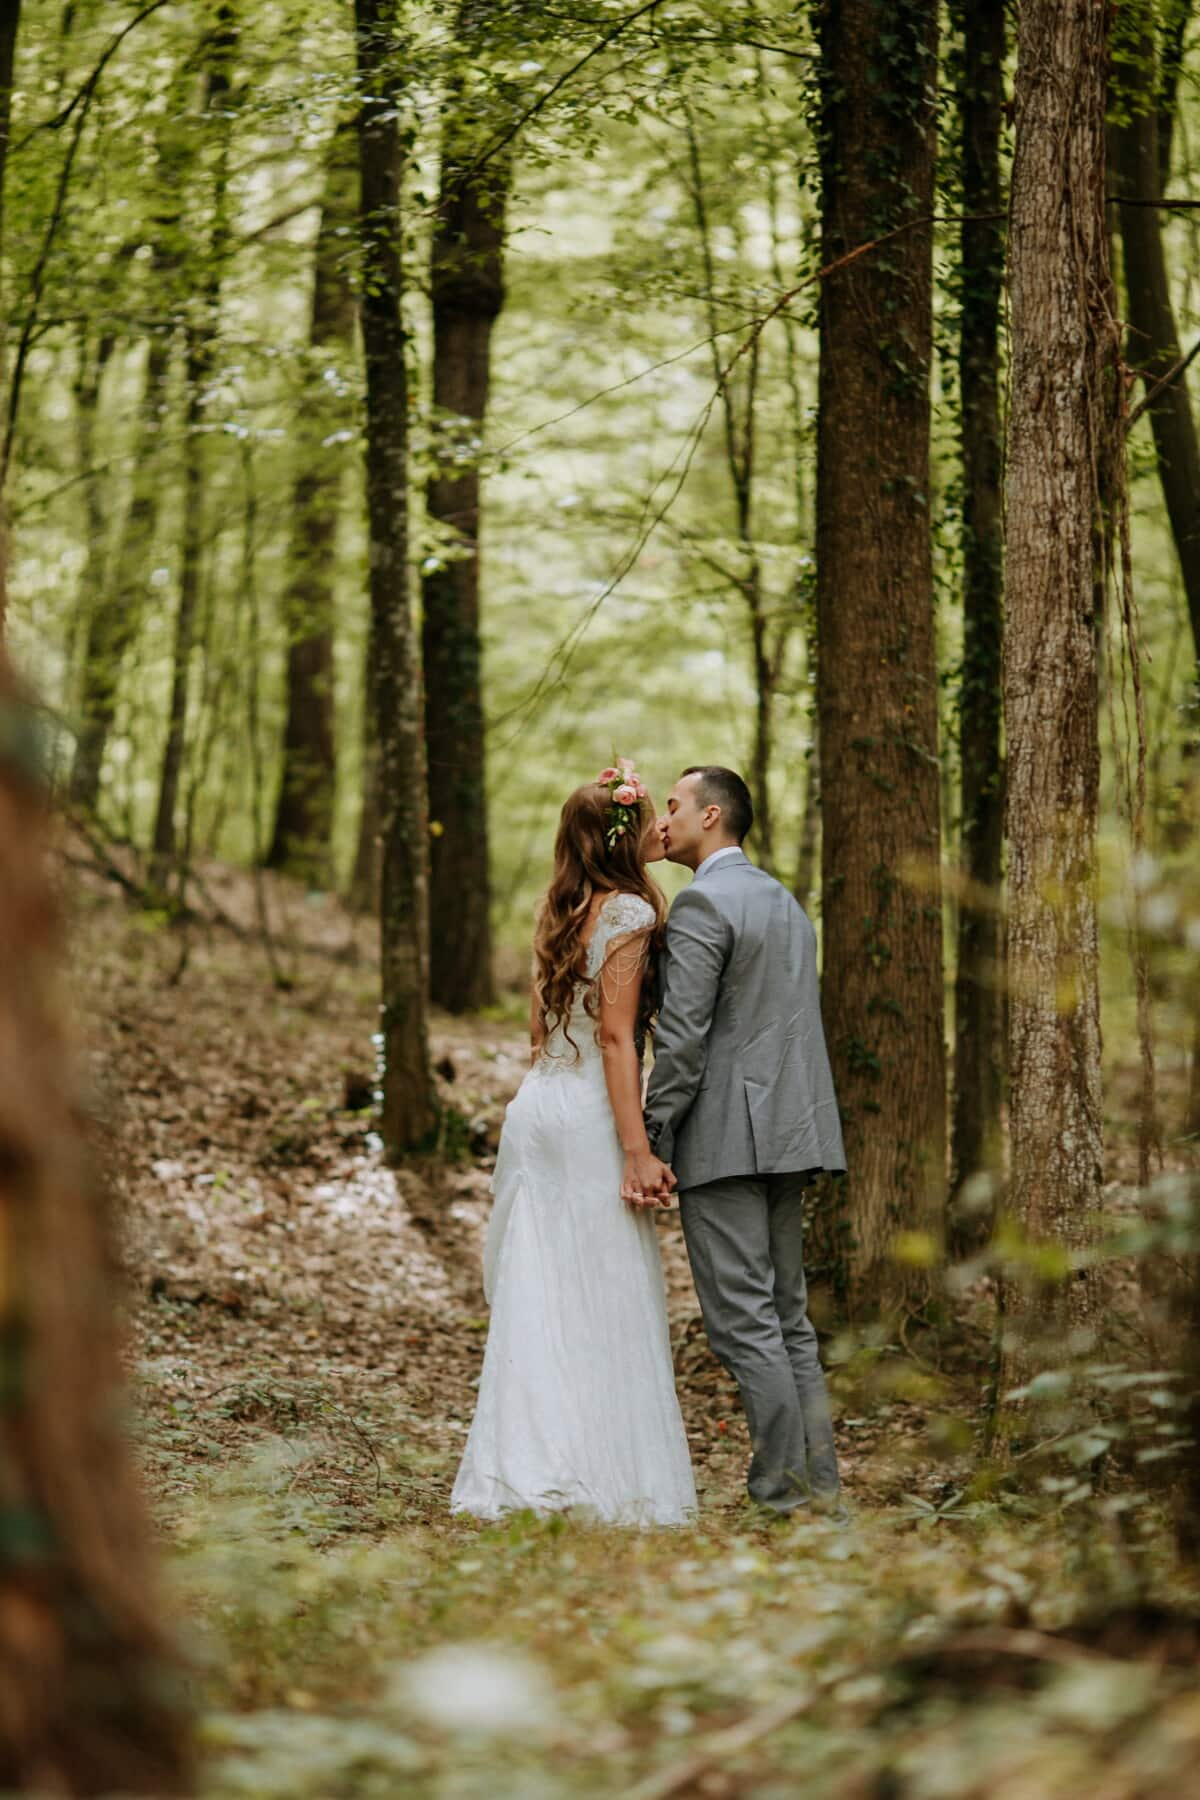 groom, kiss, bride, hike, forest, wood, love, nature, couple, wedding